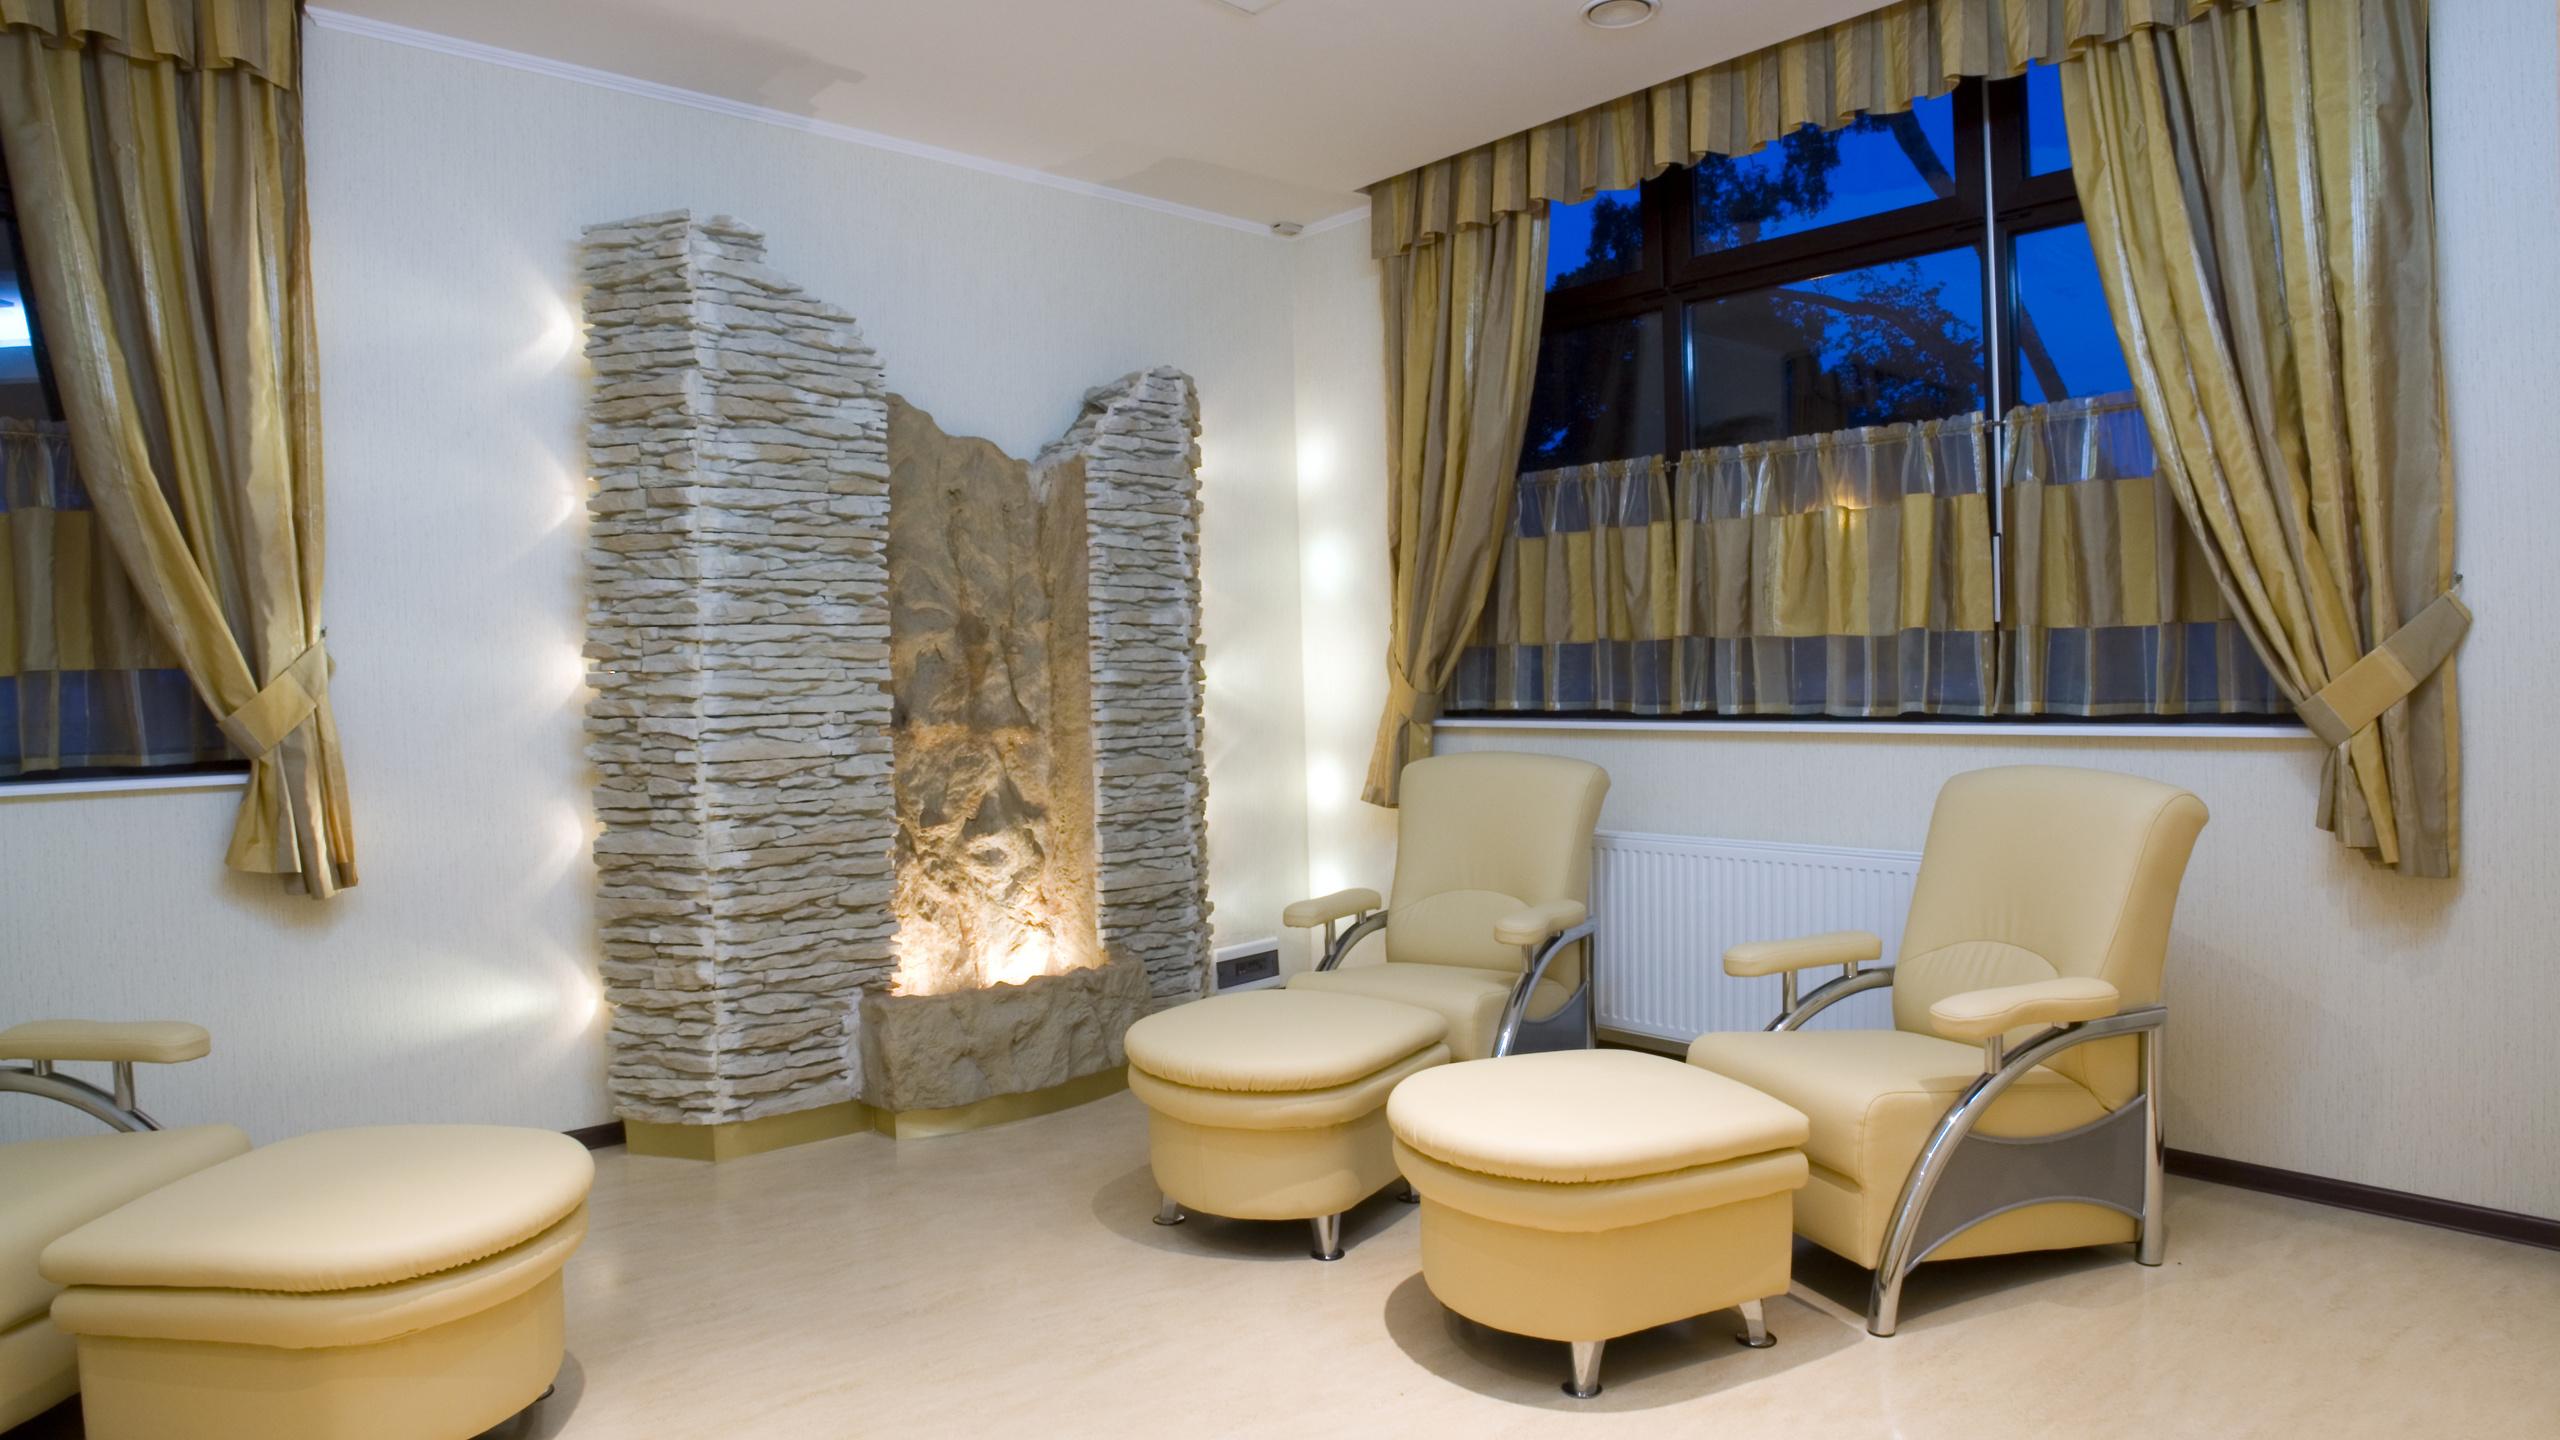 отдых, комната, окно, дом, Интерьер, обои, кресла, уют, камин,